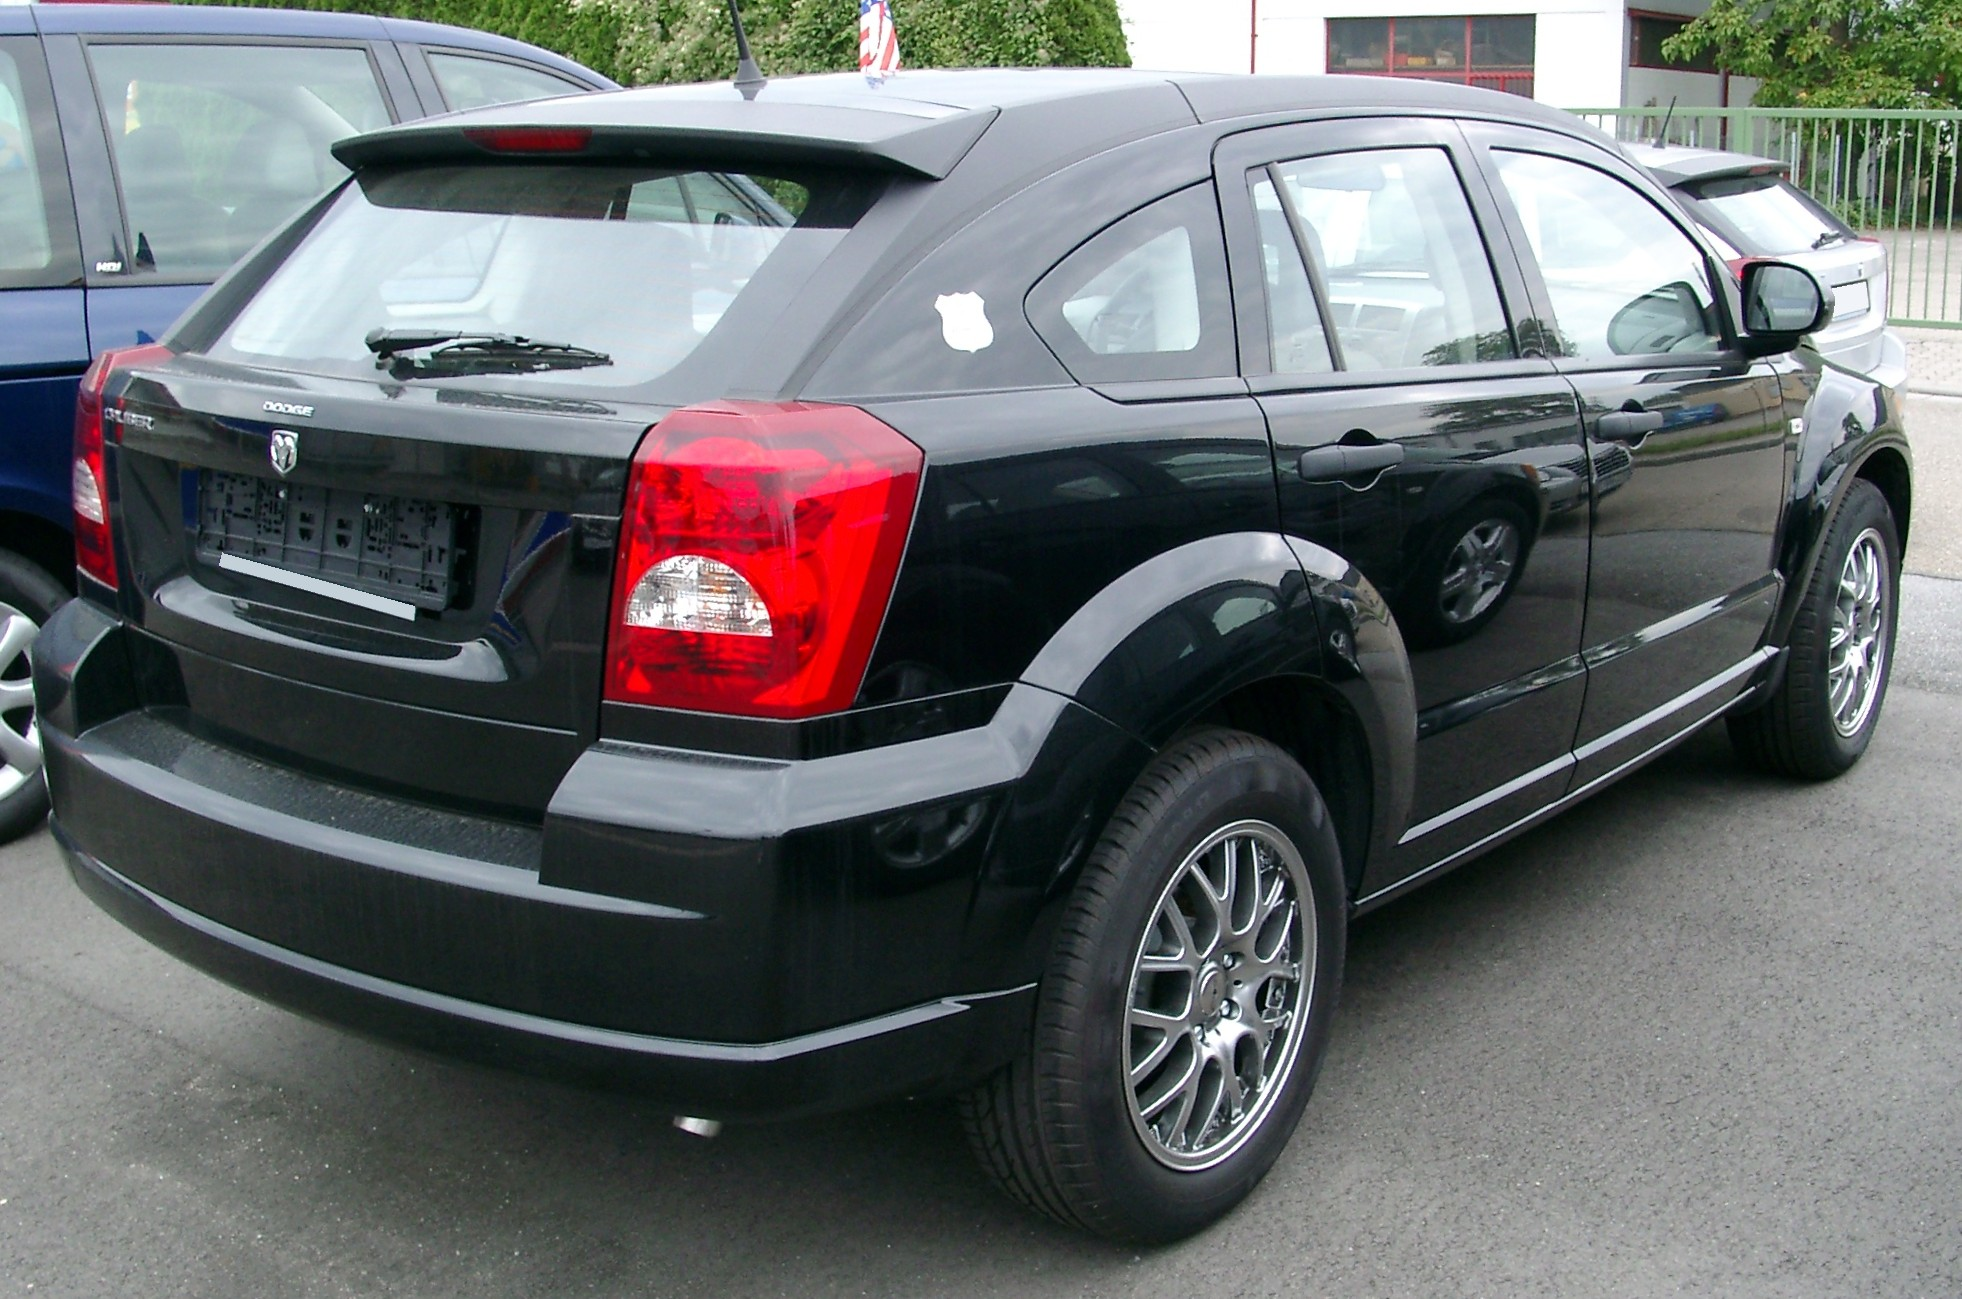 File:Dodge Caliber rear 20070902.jpg - Wikimedia Commons